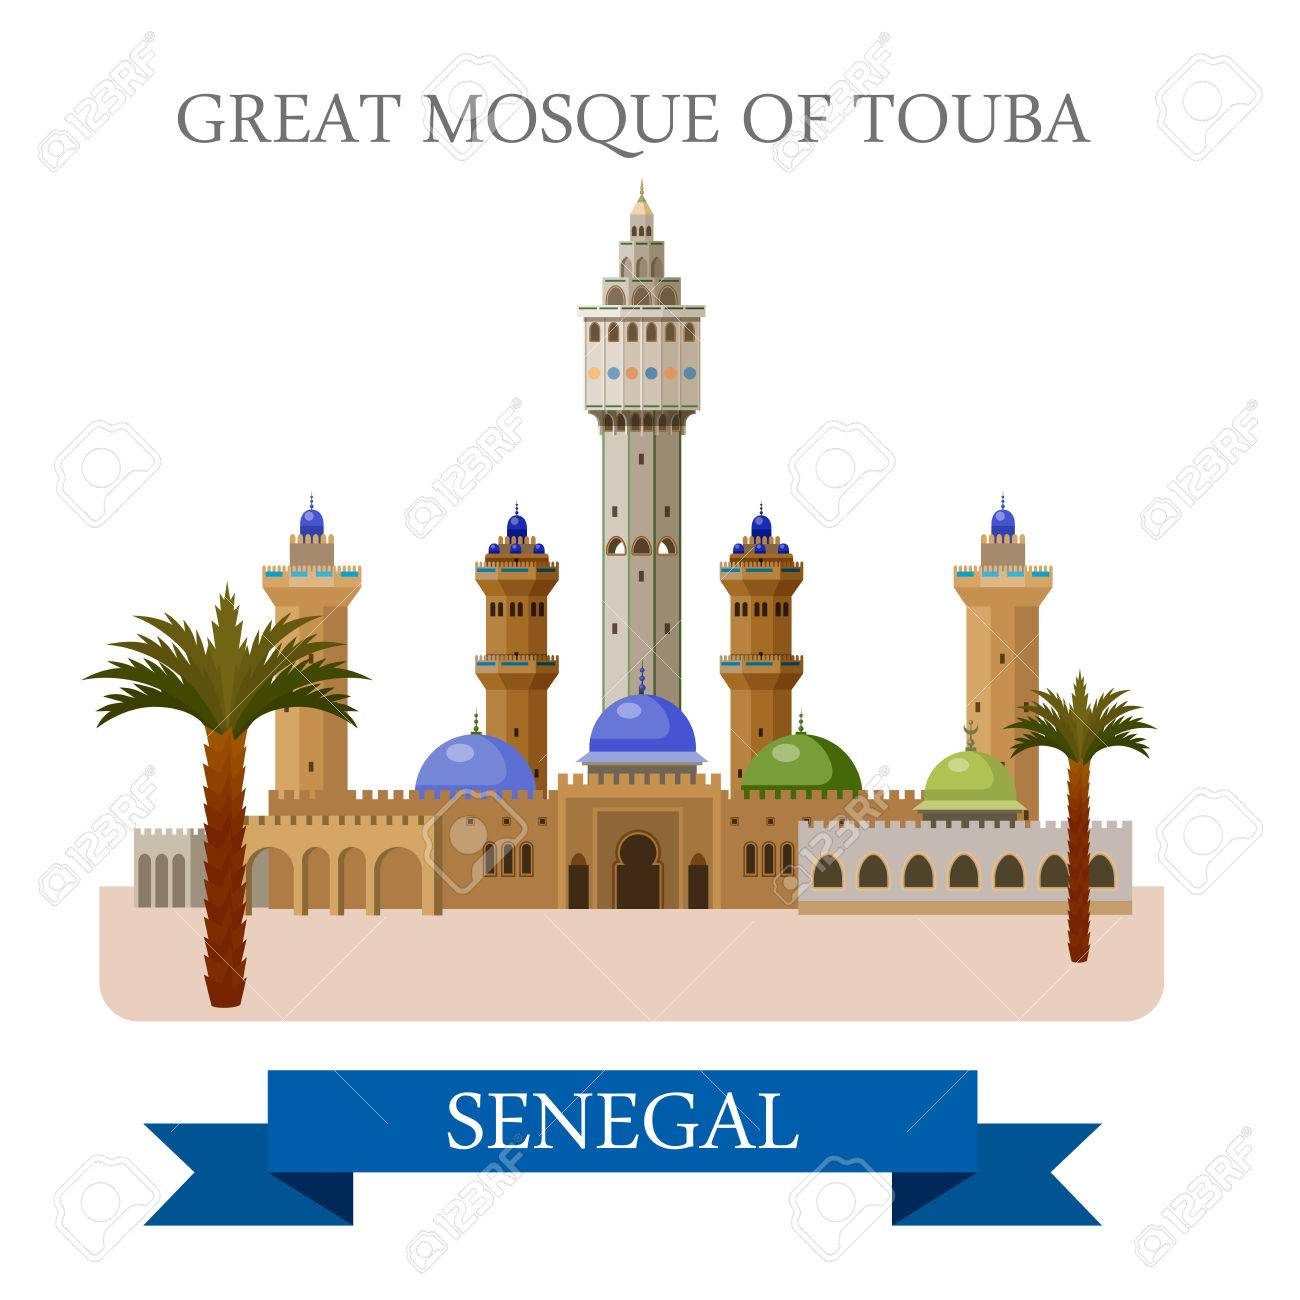 Great Mosque of Touba in Senegal  Flat cartoon style historic